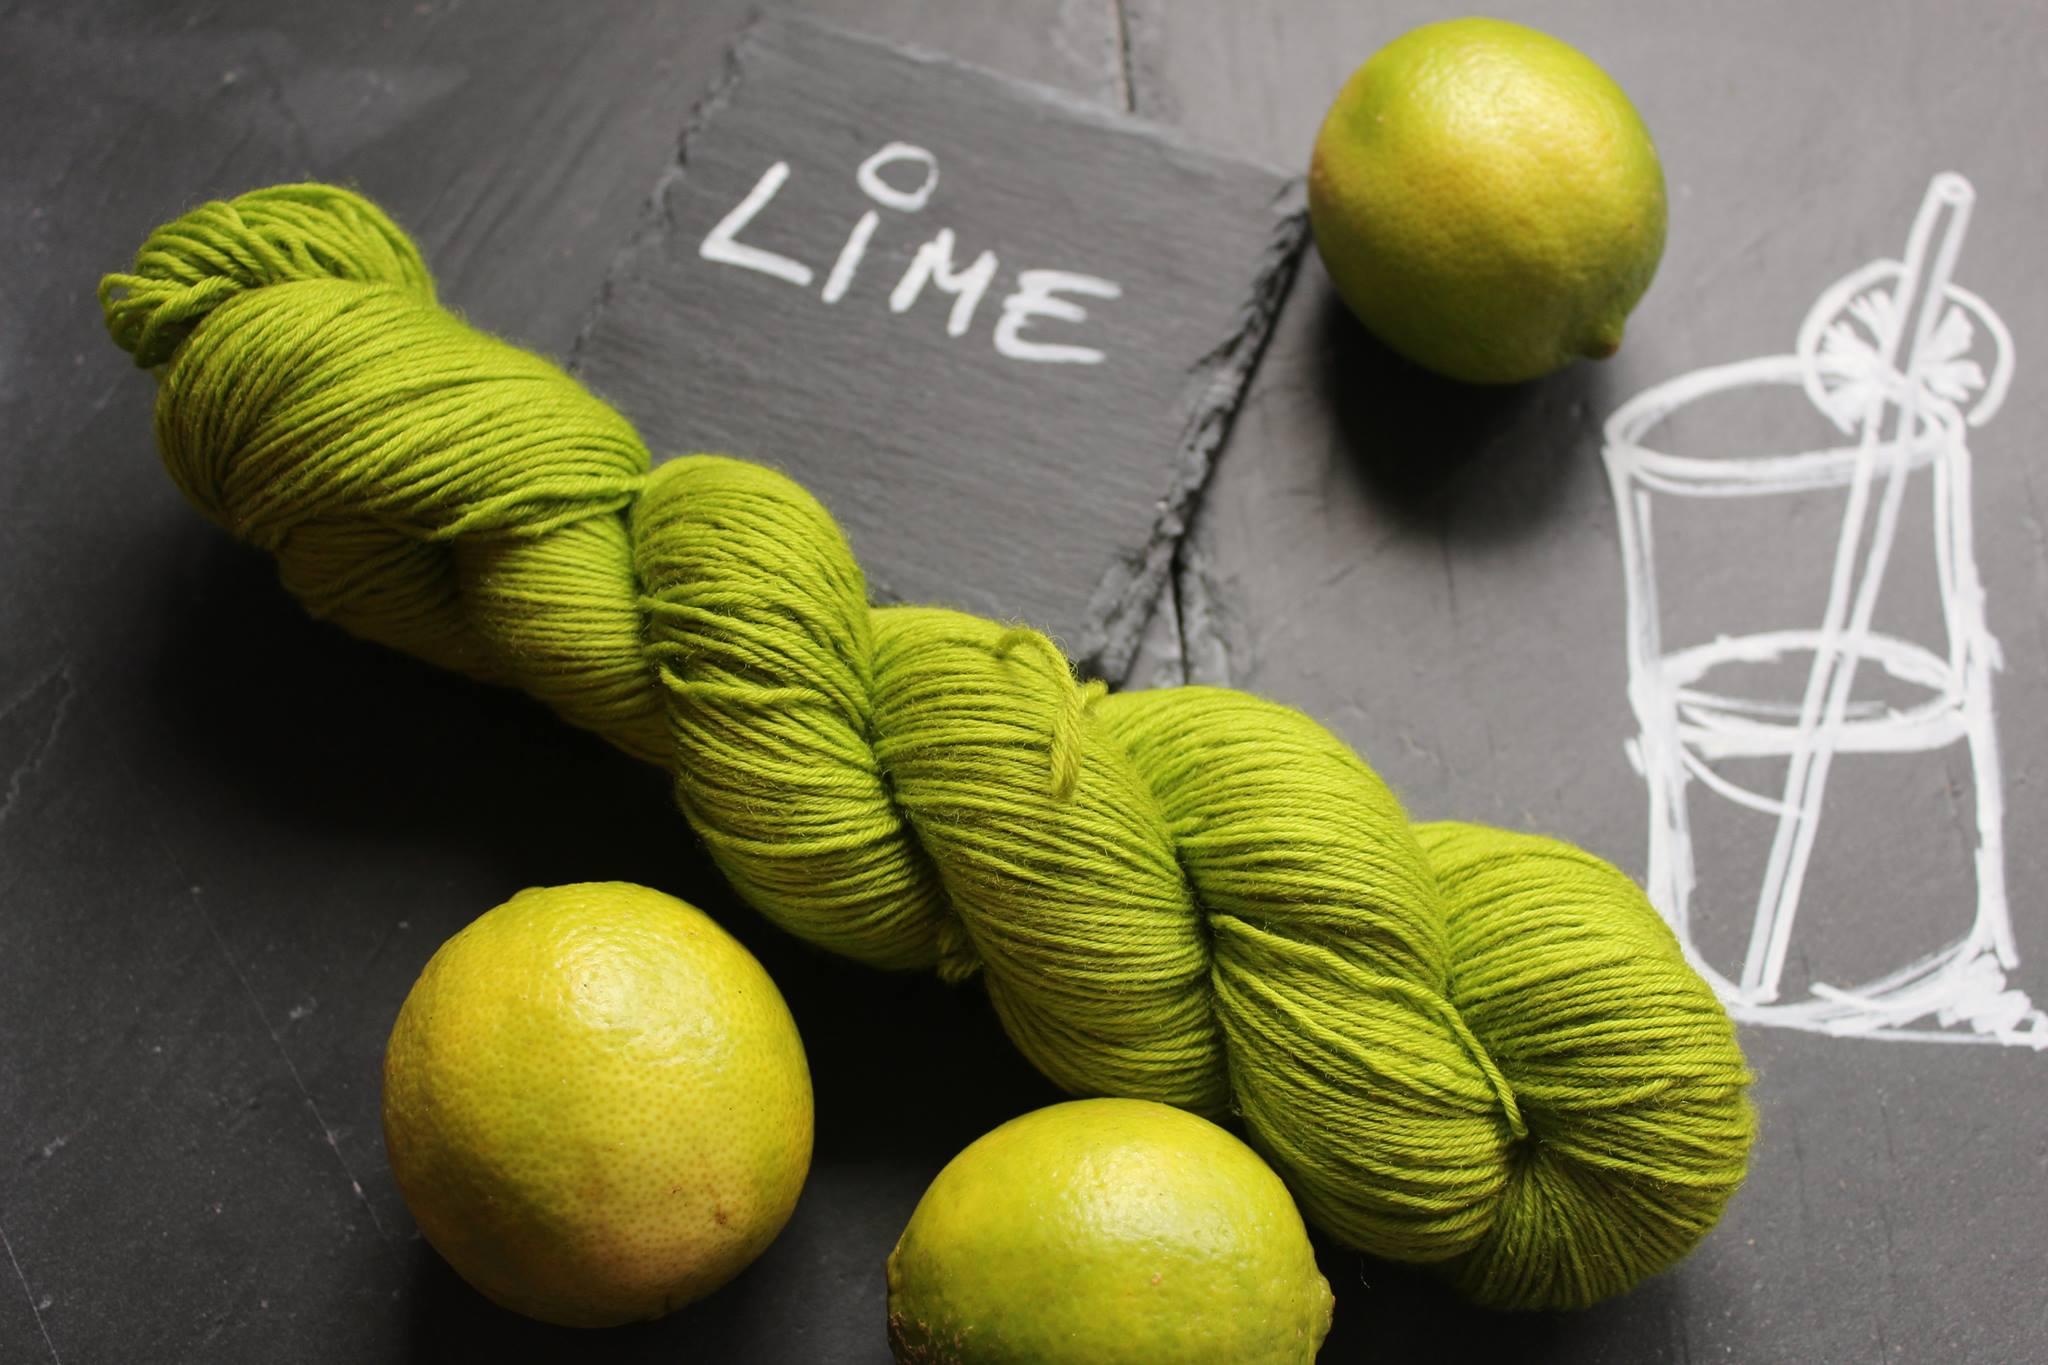 Lime Seide Merino